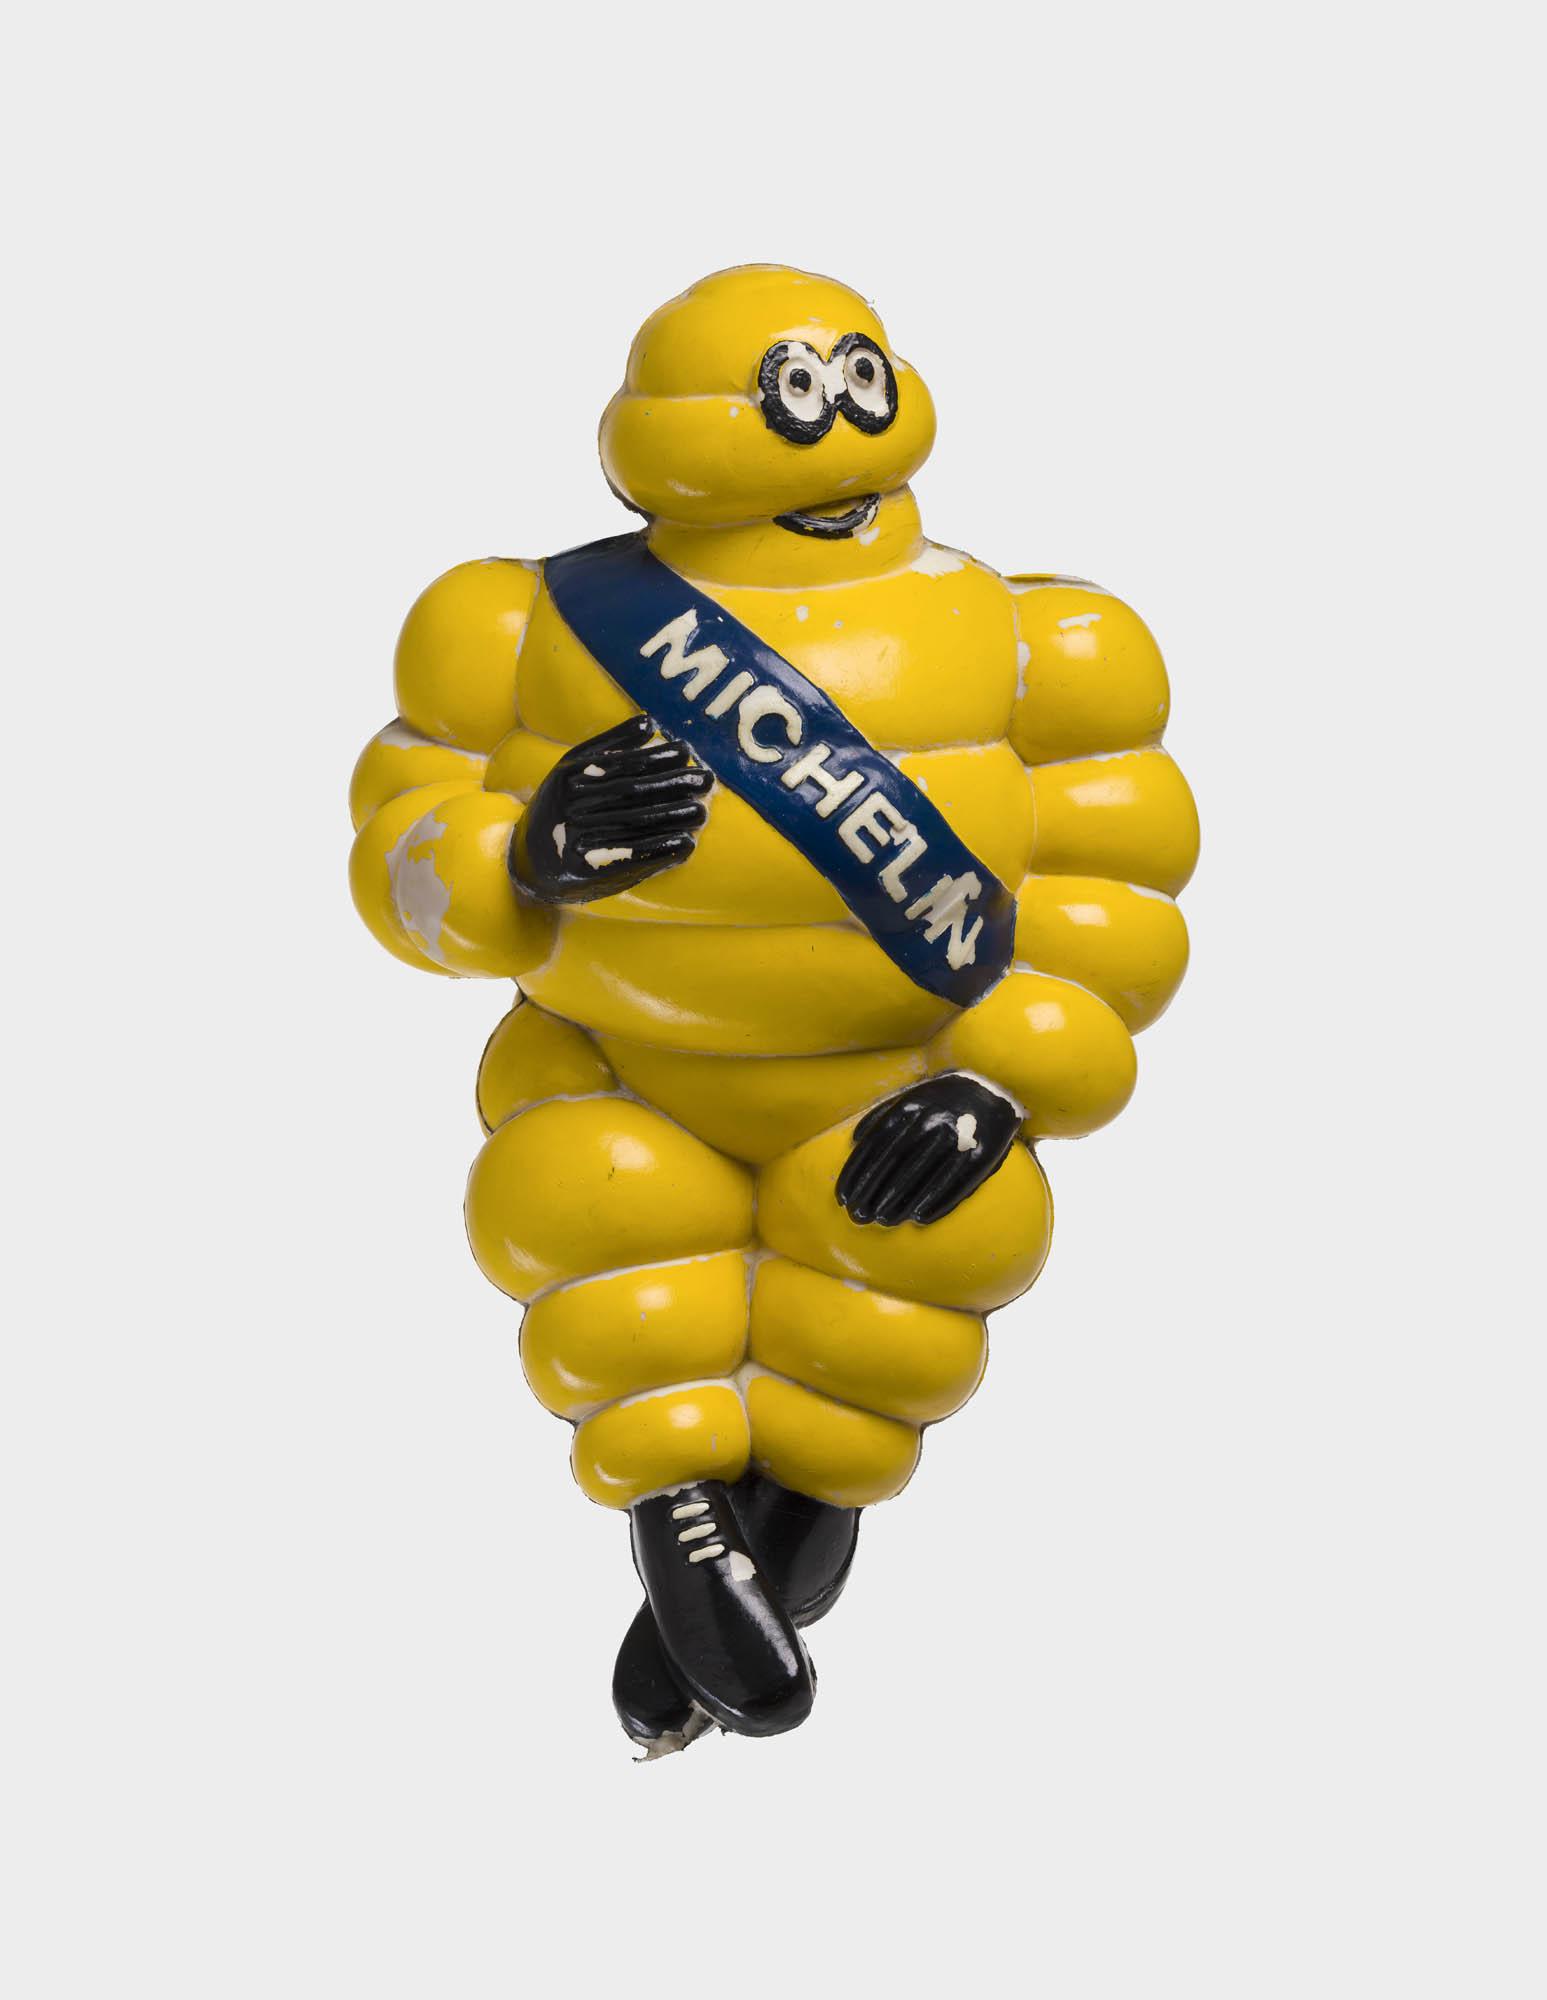 Nunc est bibendum – Le pneu Michelin boit l'obstacle O'Galop (Marius Rossillon) Plakat